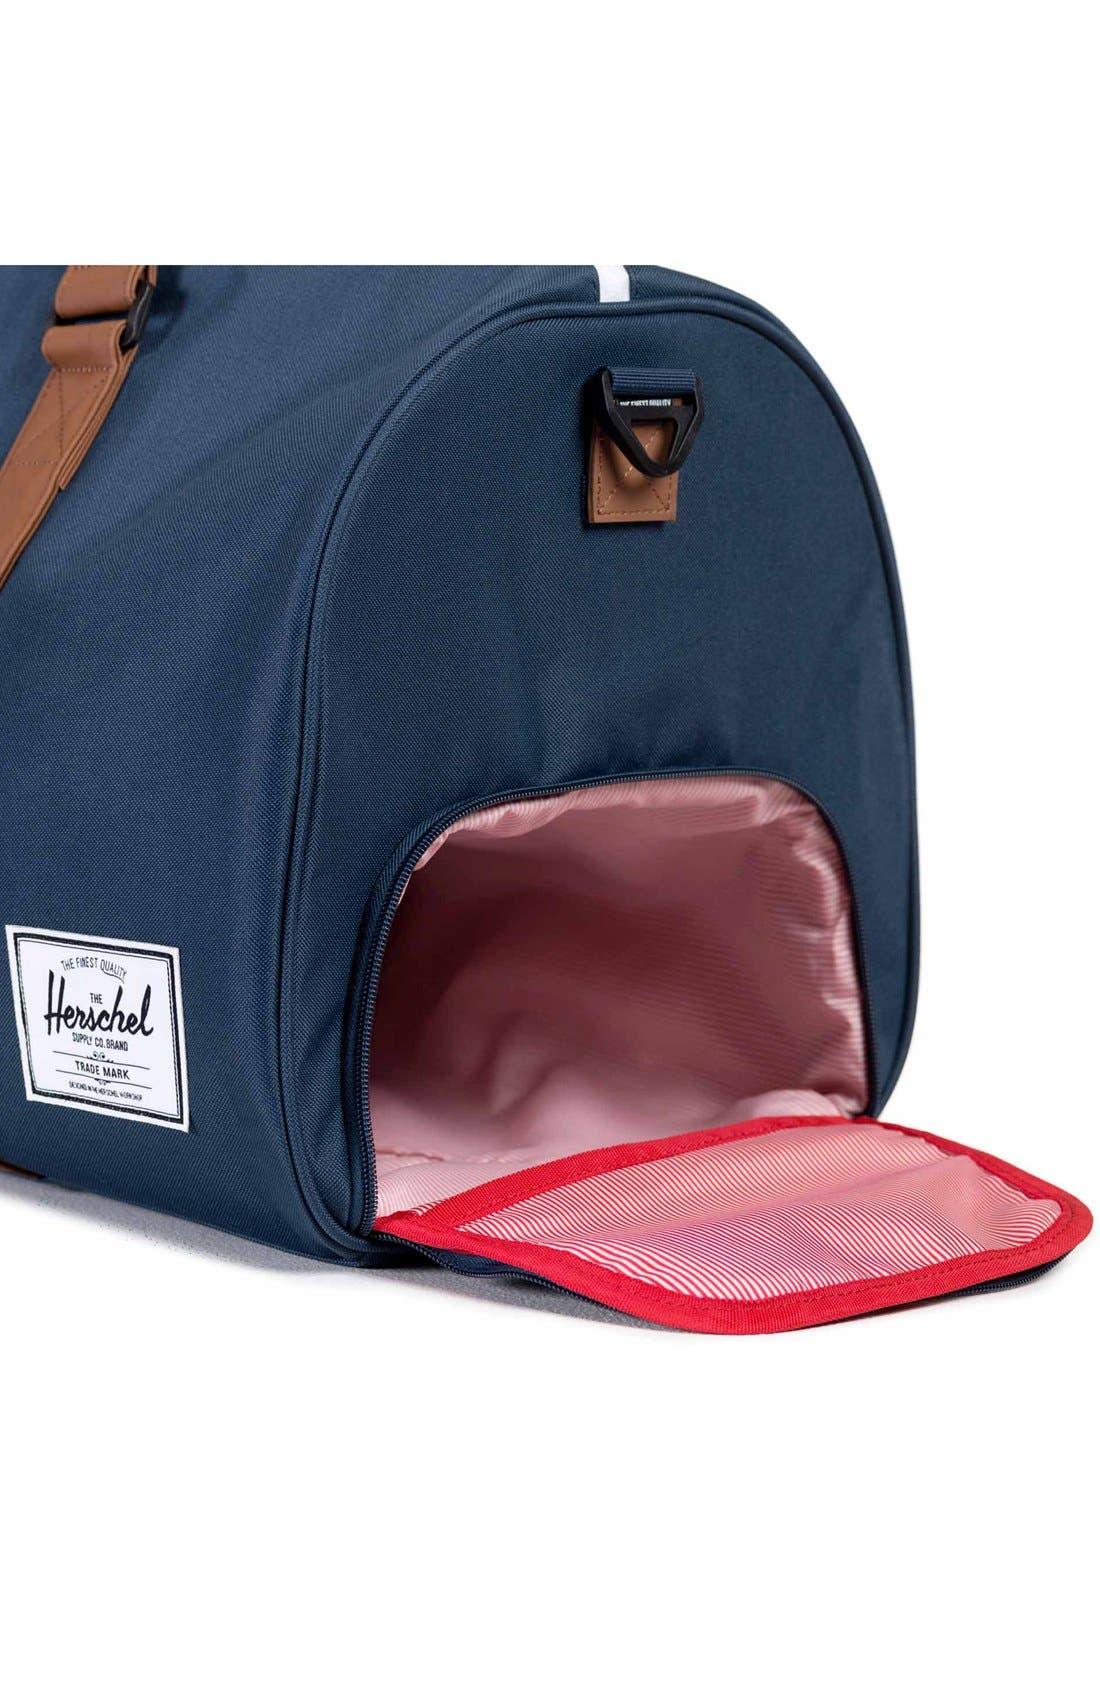 Alternate Image 2  - Herschel Supply Co. 'Novel' Duffel Bag